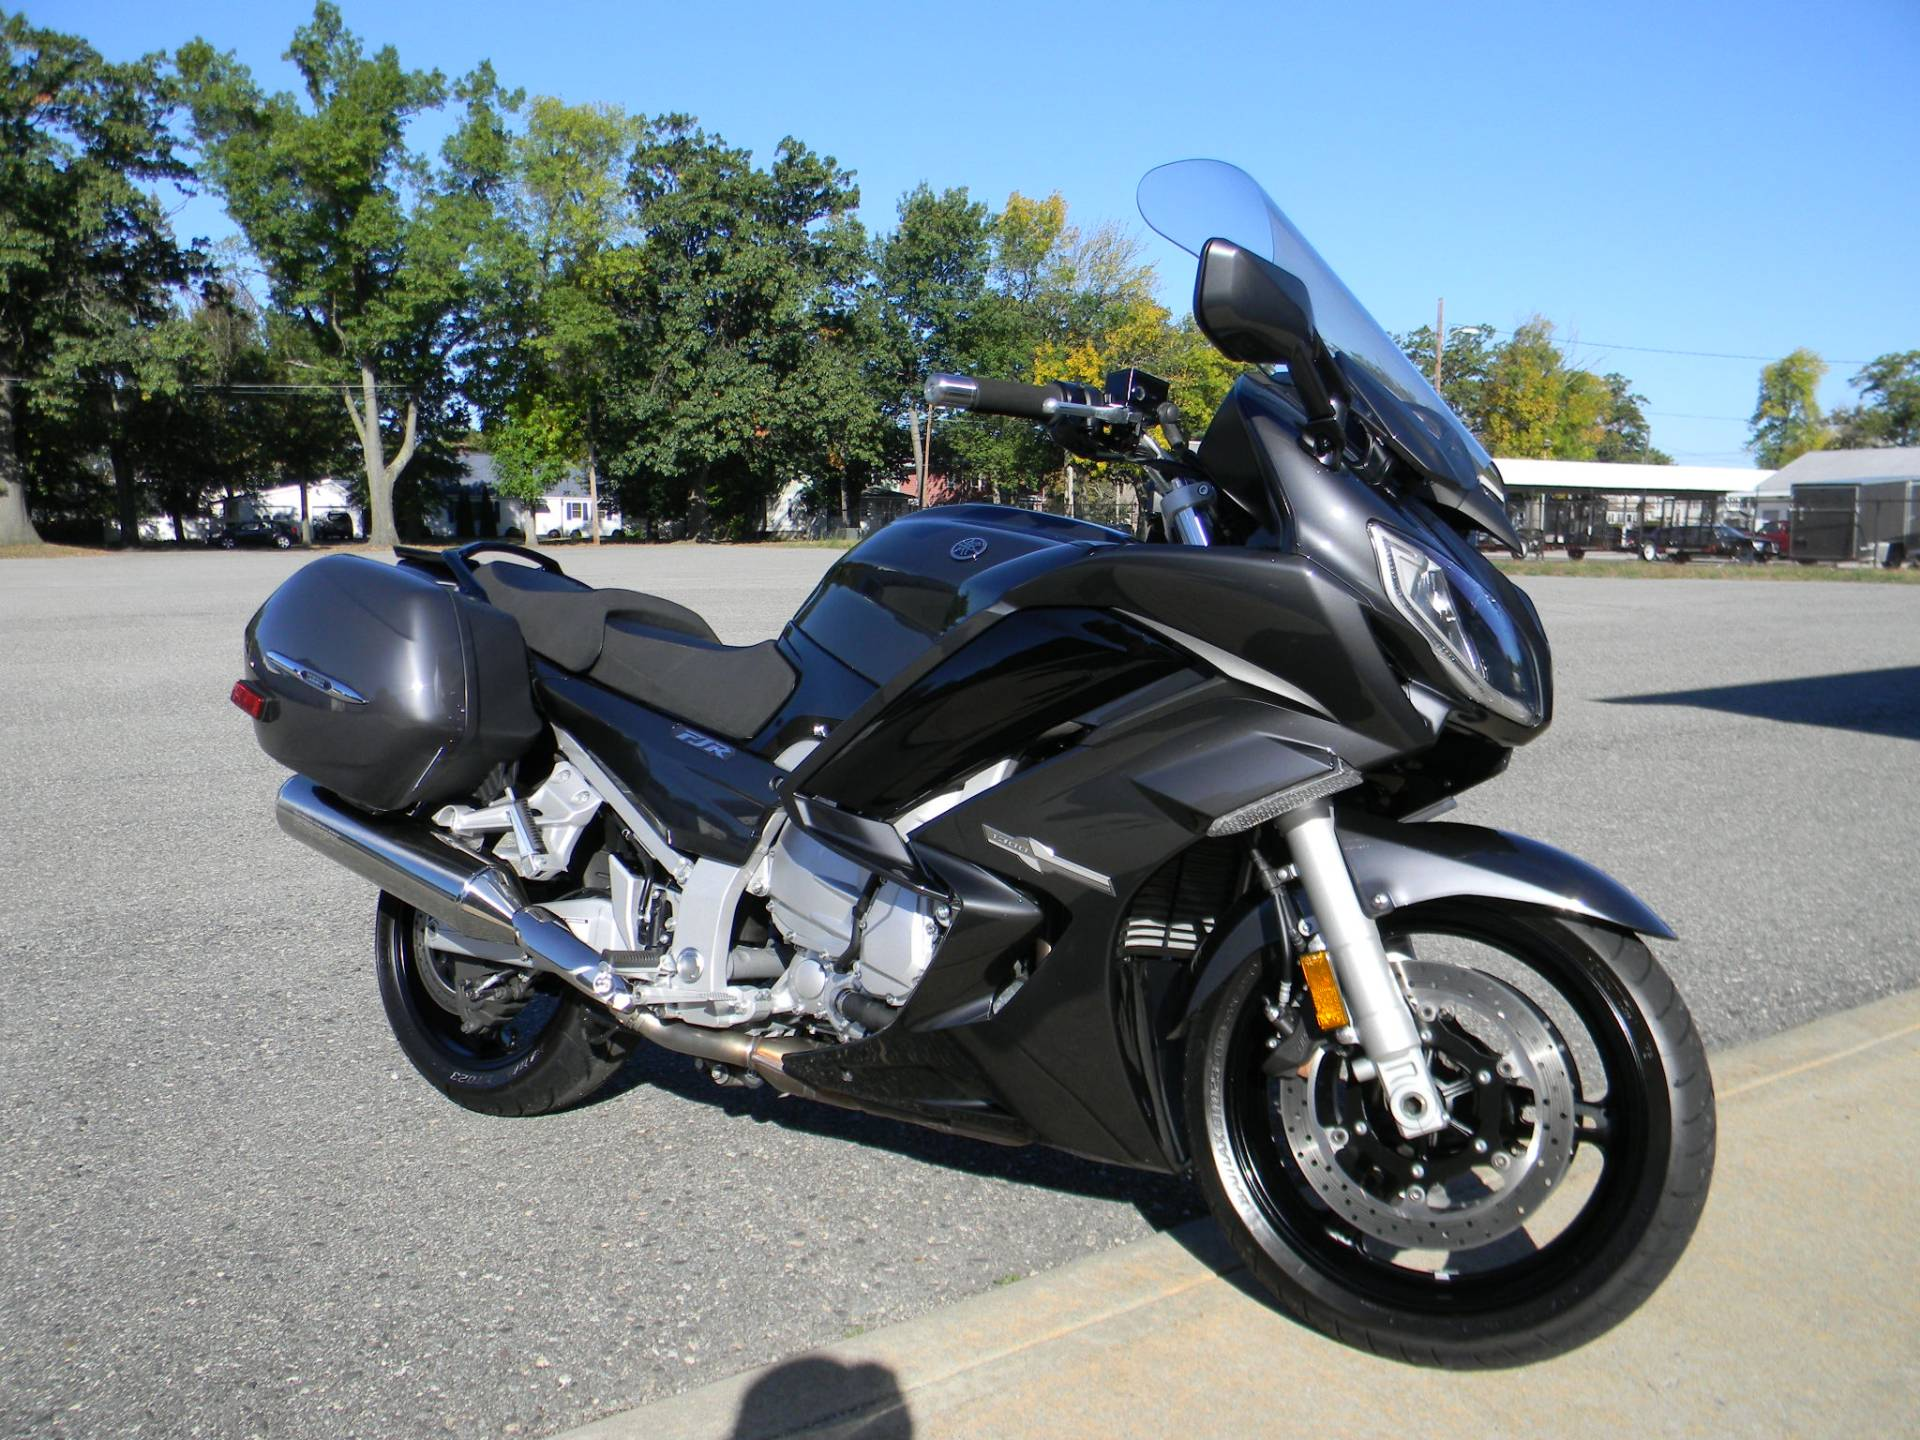 2015 Yamaha FJR1300A 2